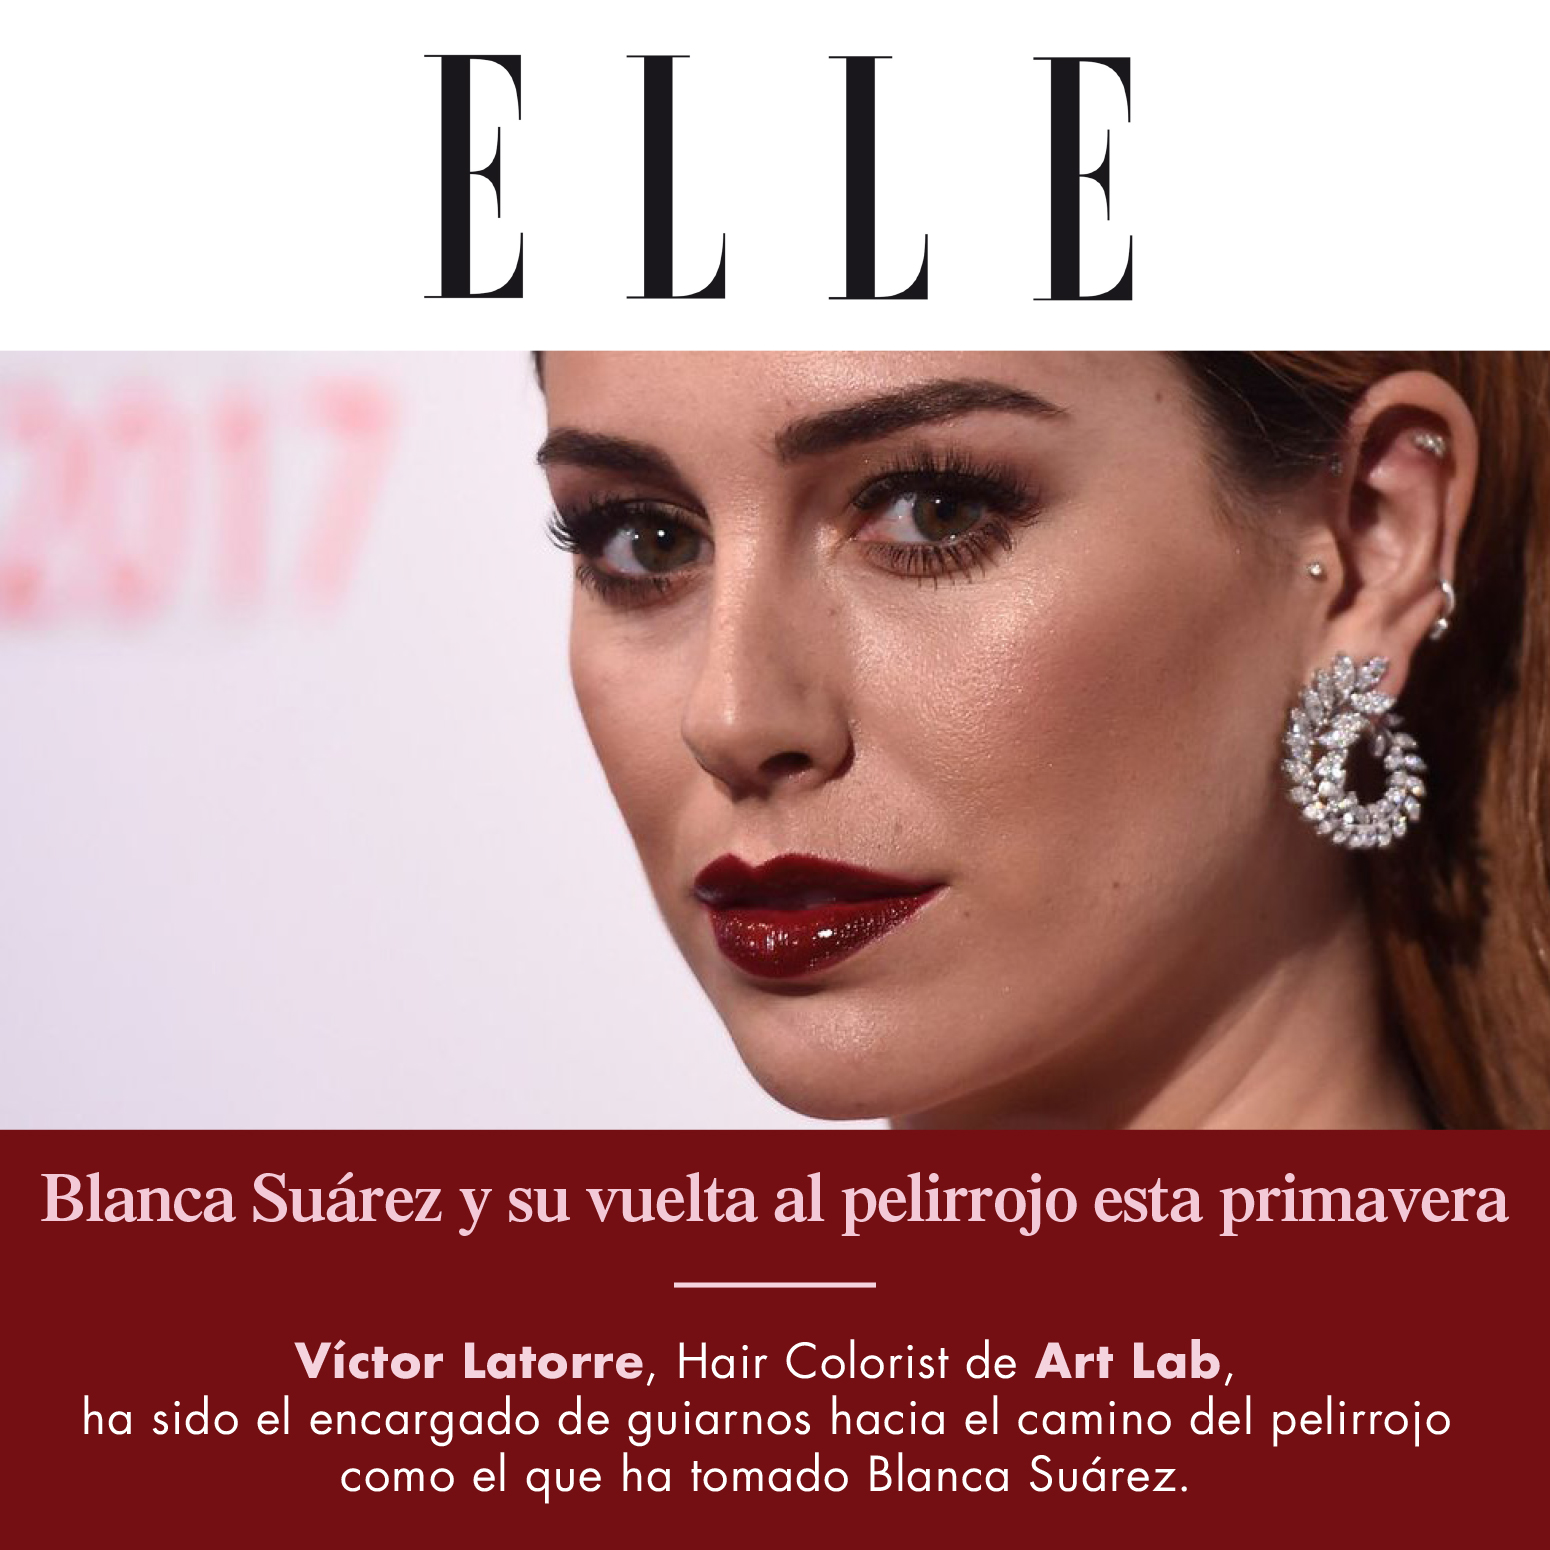 ArtLab---Web-Banners-BLANCA SUAREZ